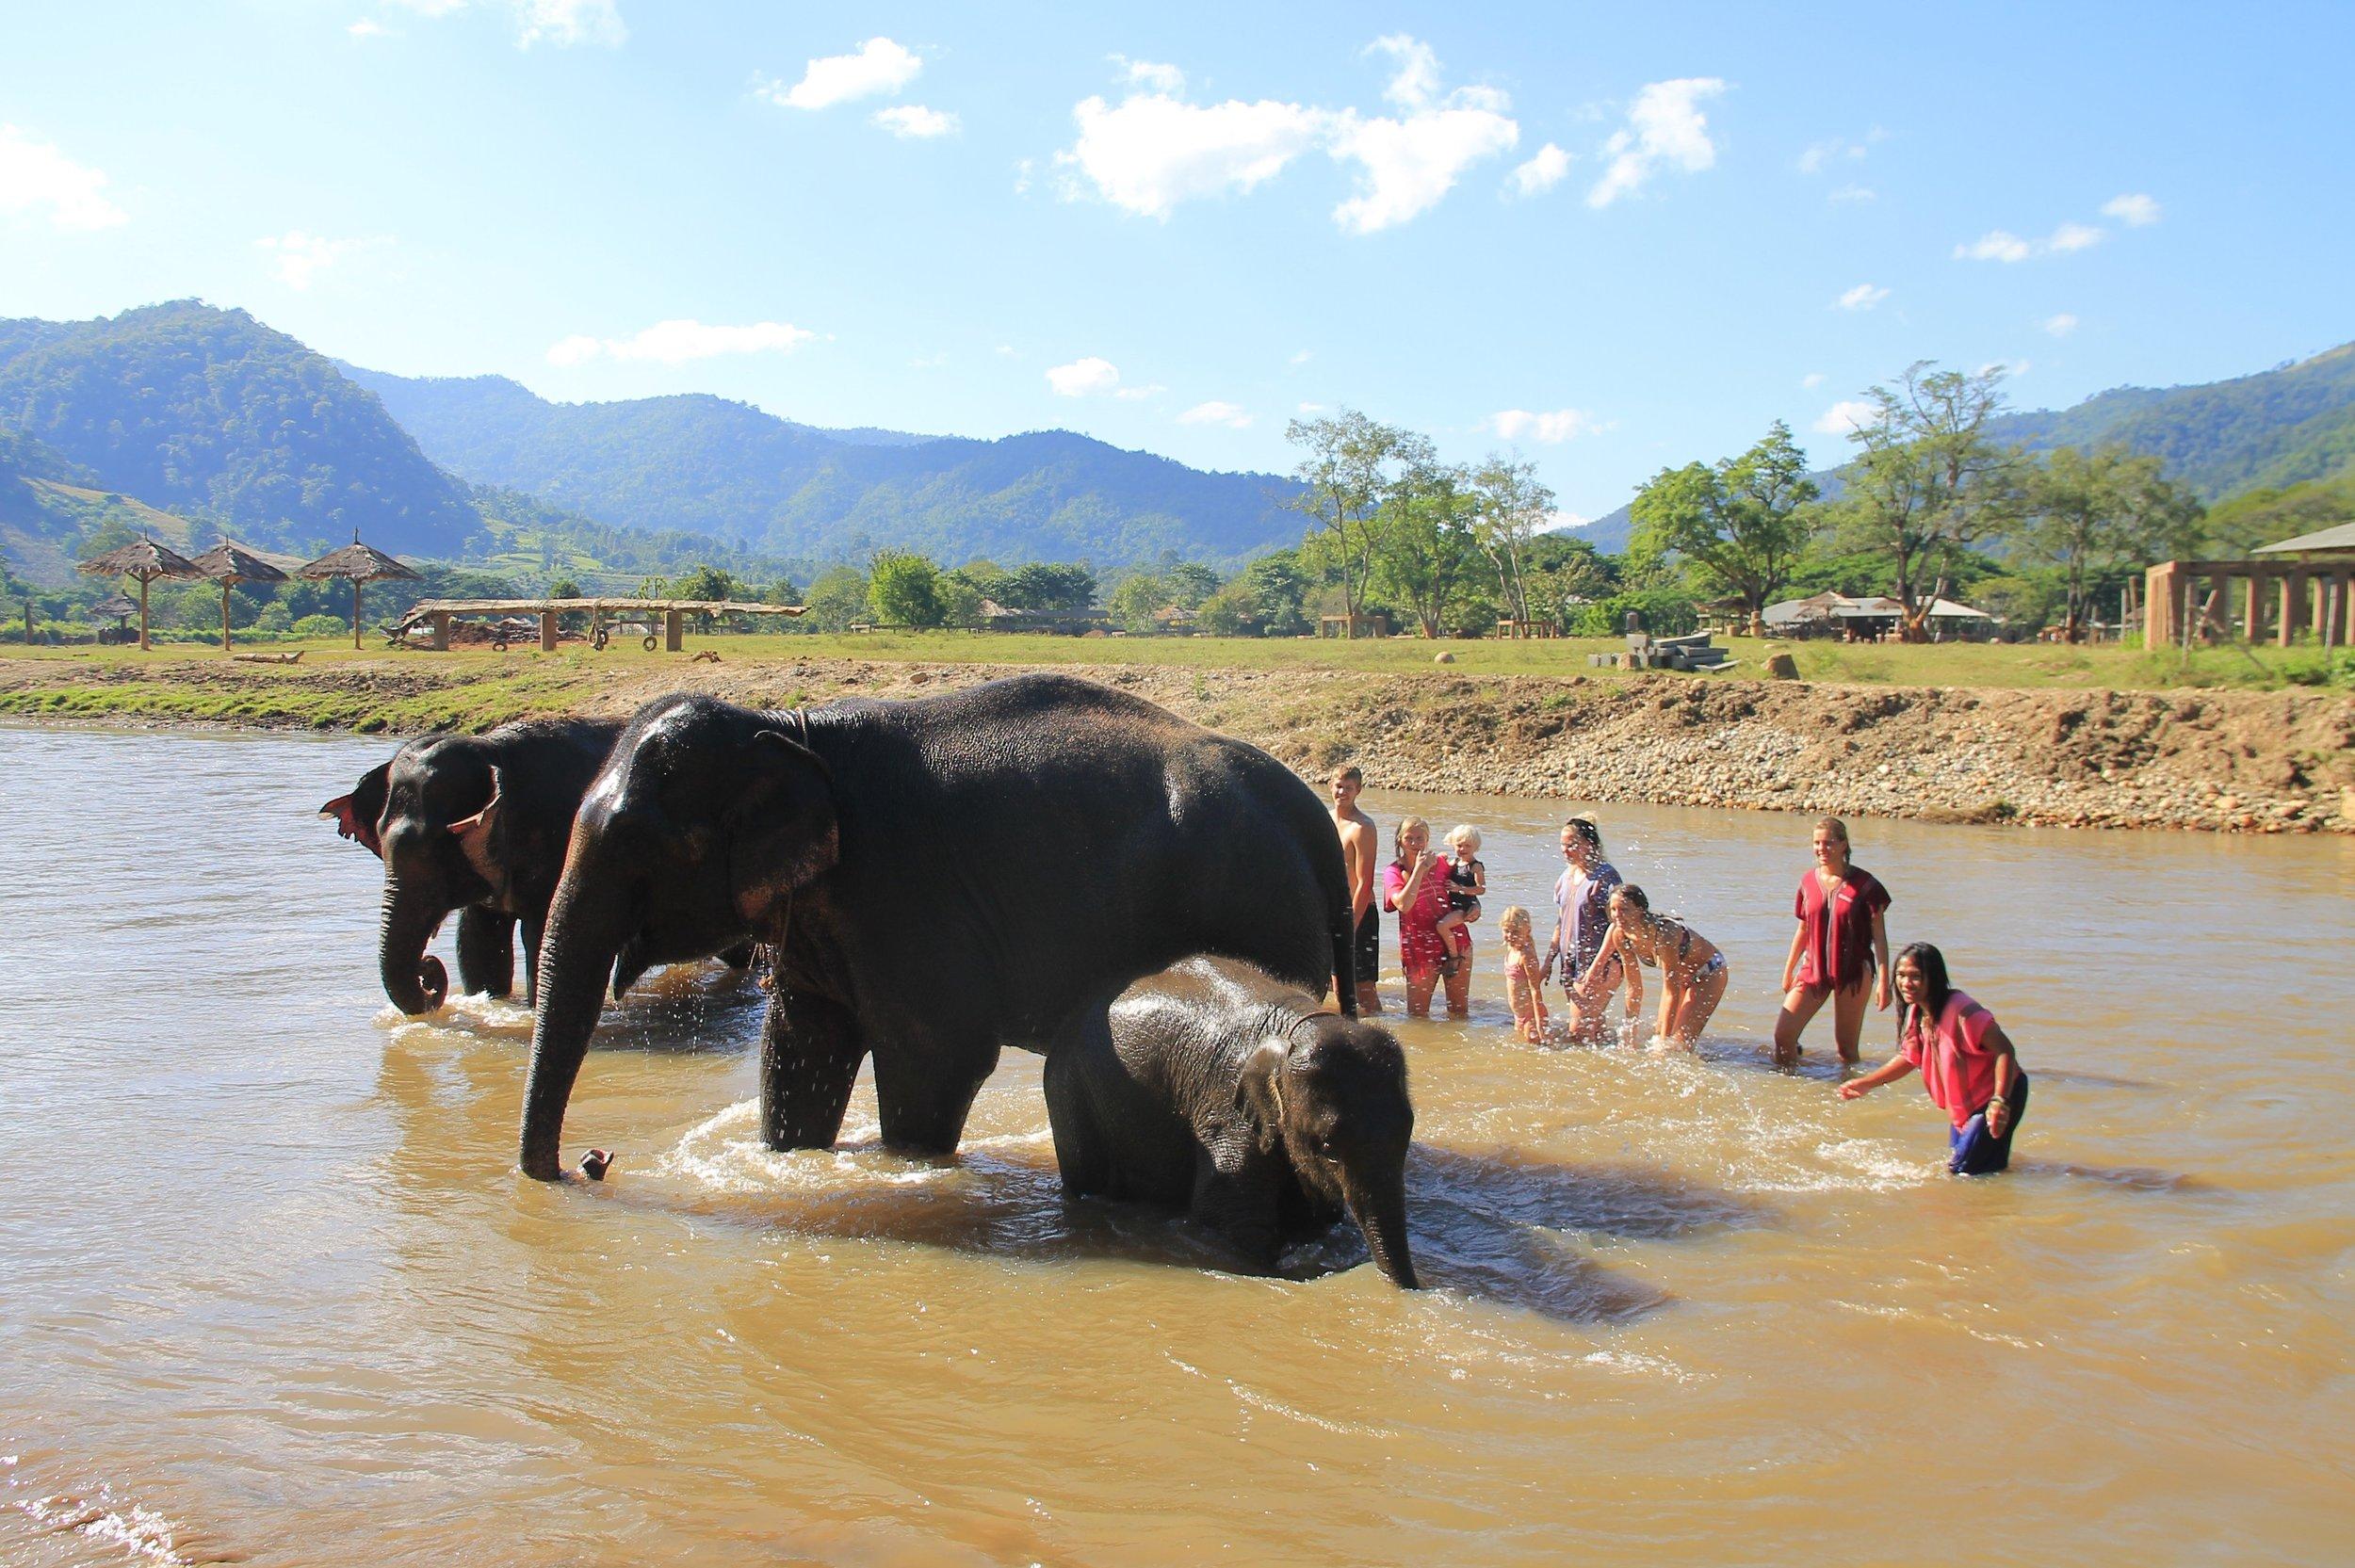 Happy Elephant Home tripadvisor.jpg